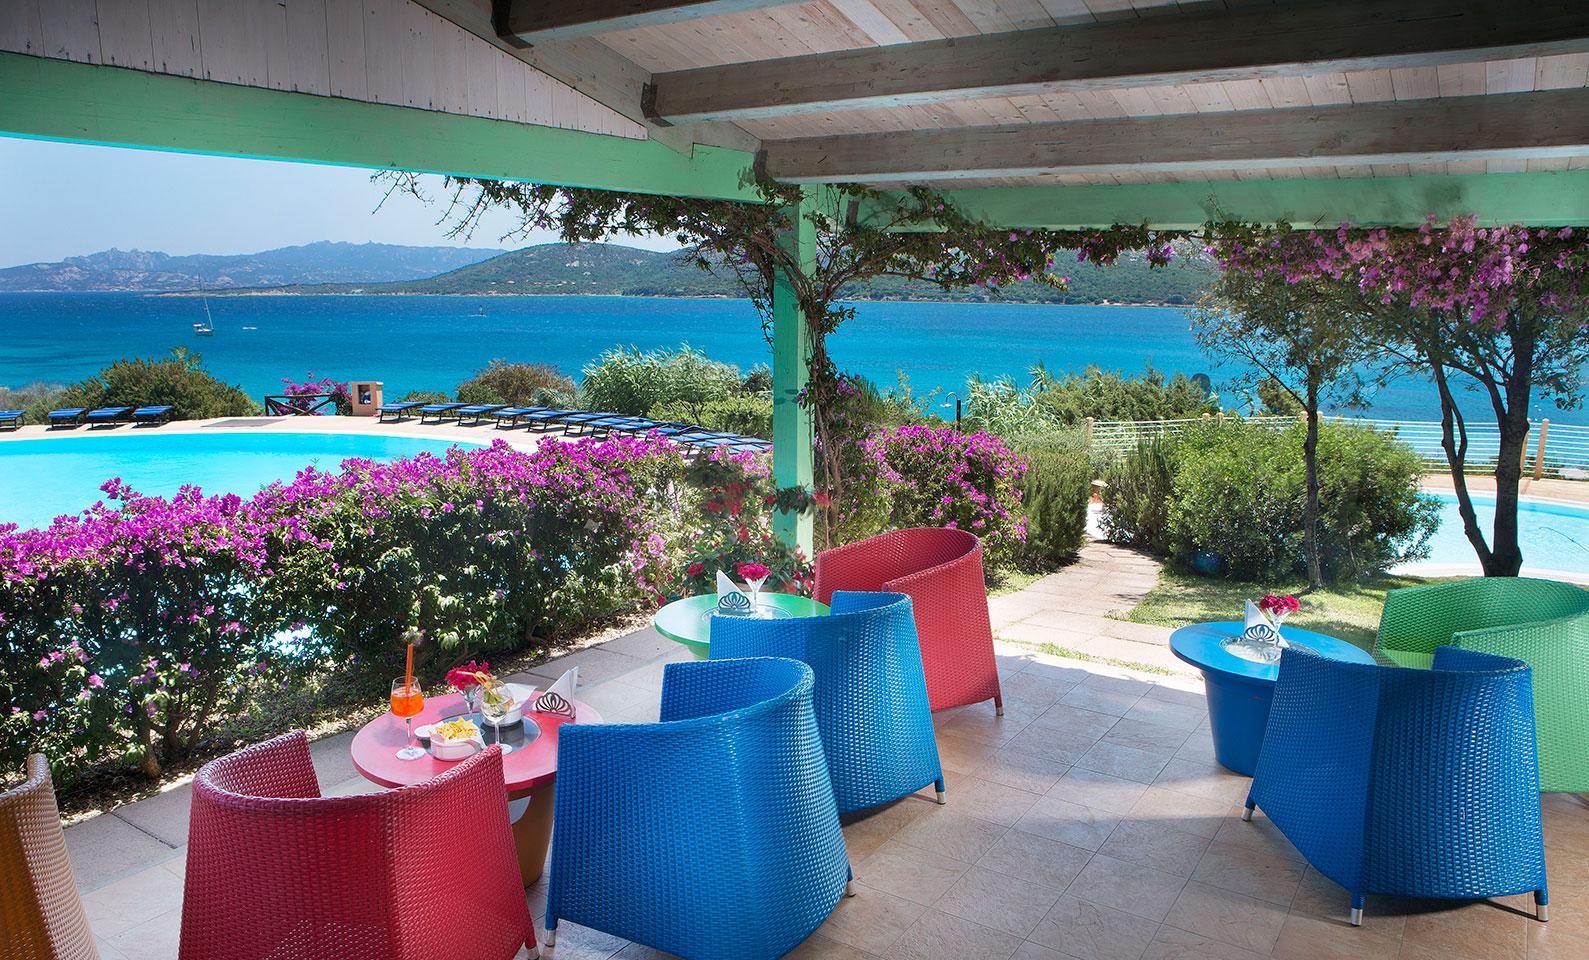 Park Hotel And Spa Cala Di Lepre